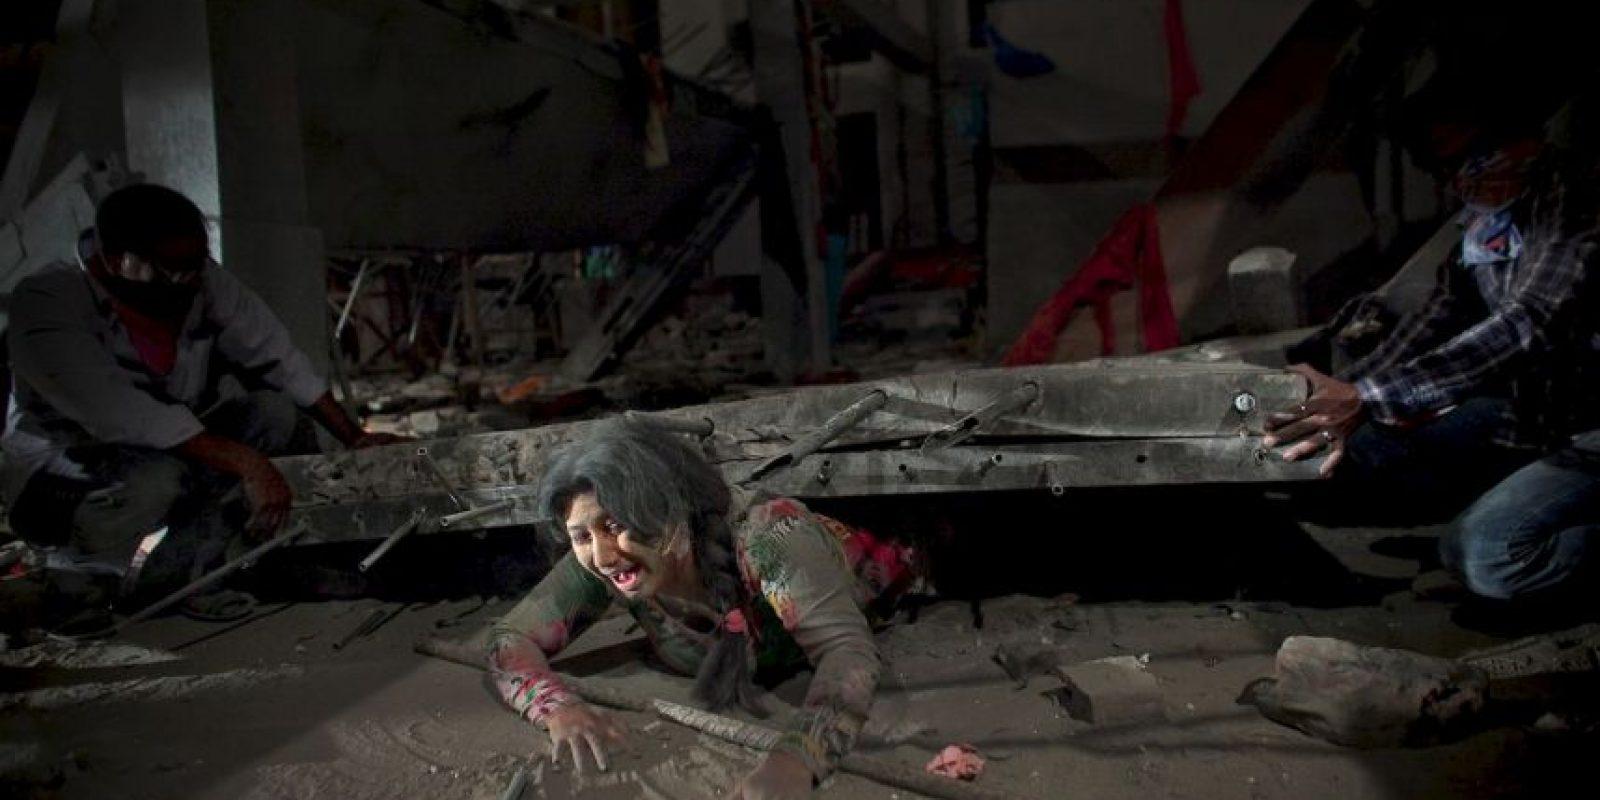 5. Colapso de plaza comercial en Dhaka, Bangladesh, 2013 Foto:Getty Images